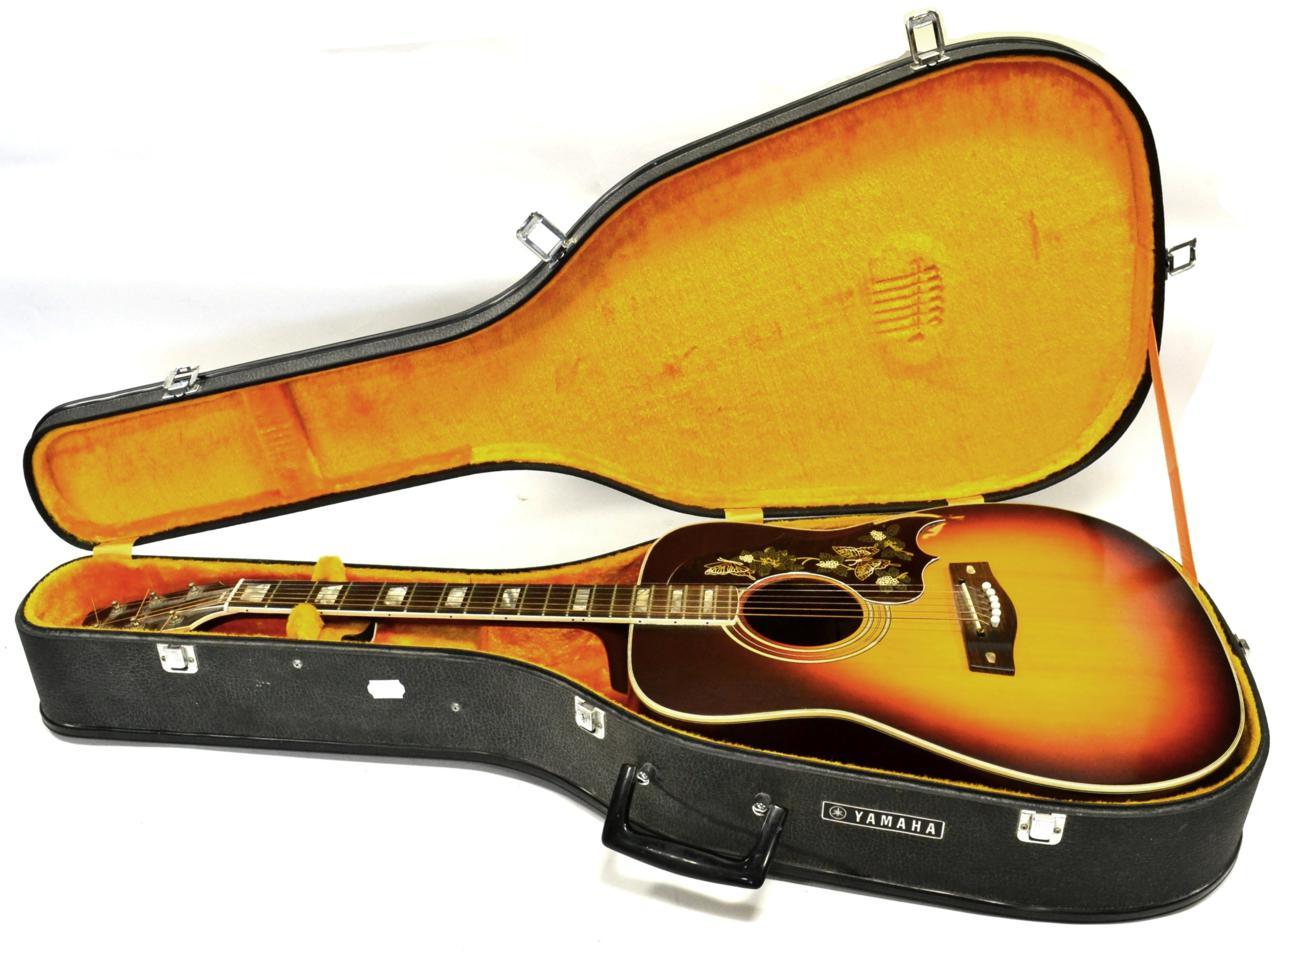 yamaha fg700s. Lot 77 - Yamaha FG700S Acoustic Guitar No.41023 (1974), Two Piece Fg700s